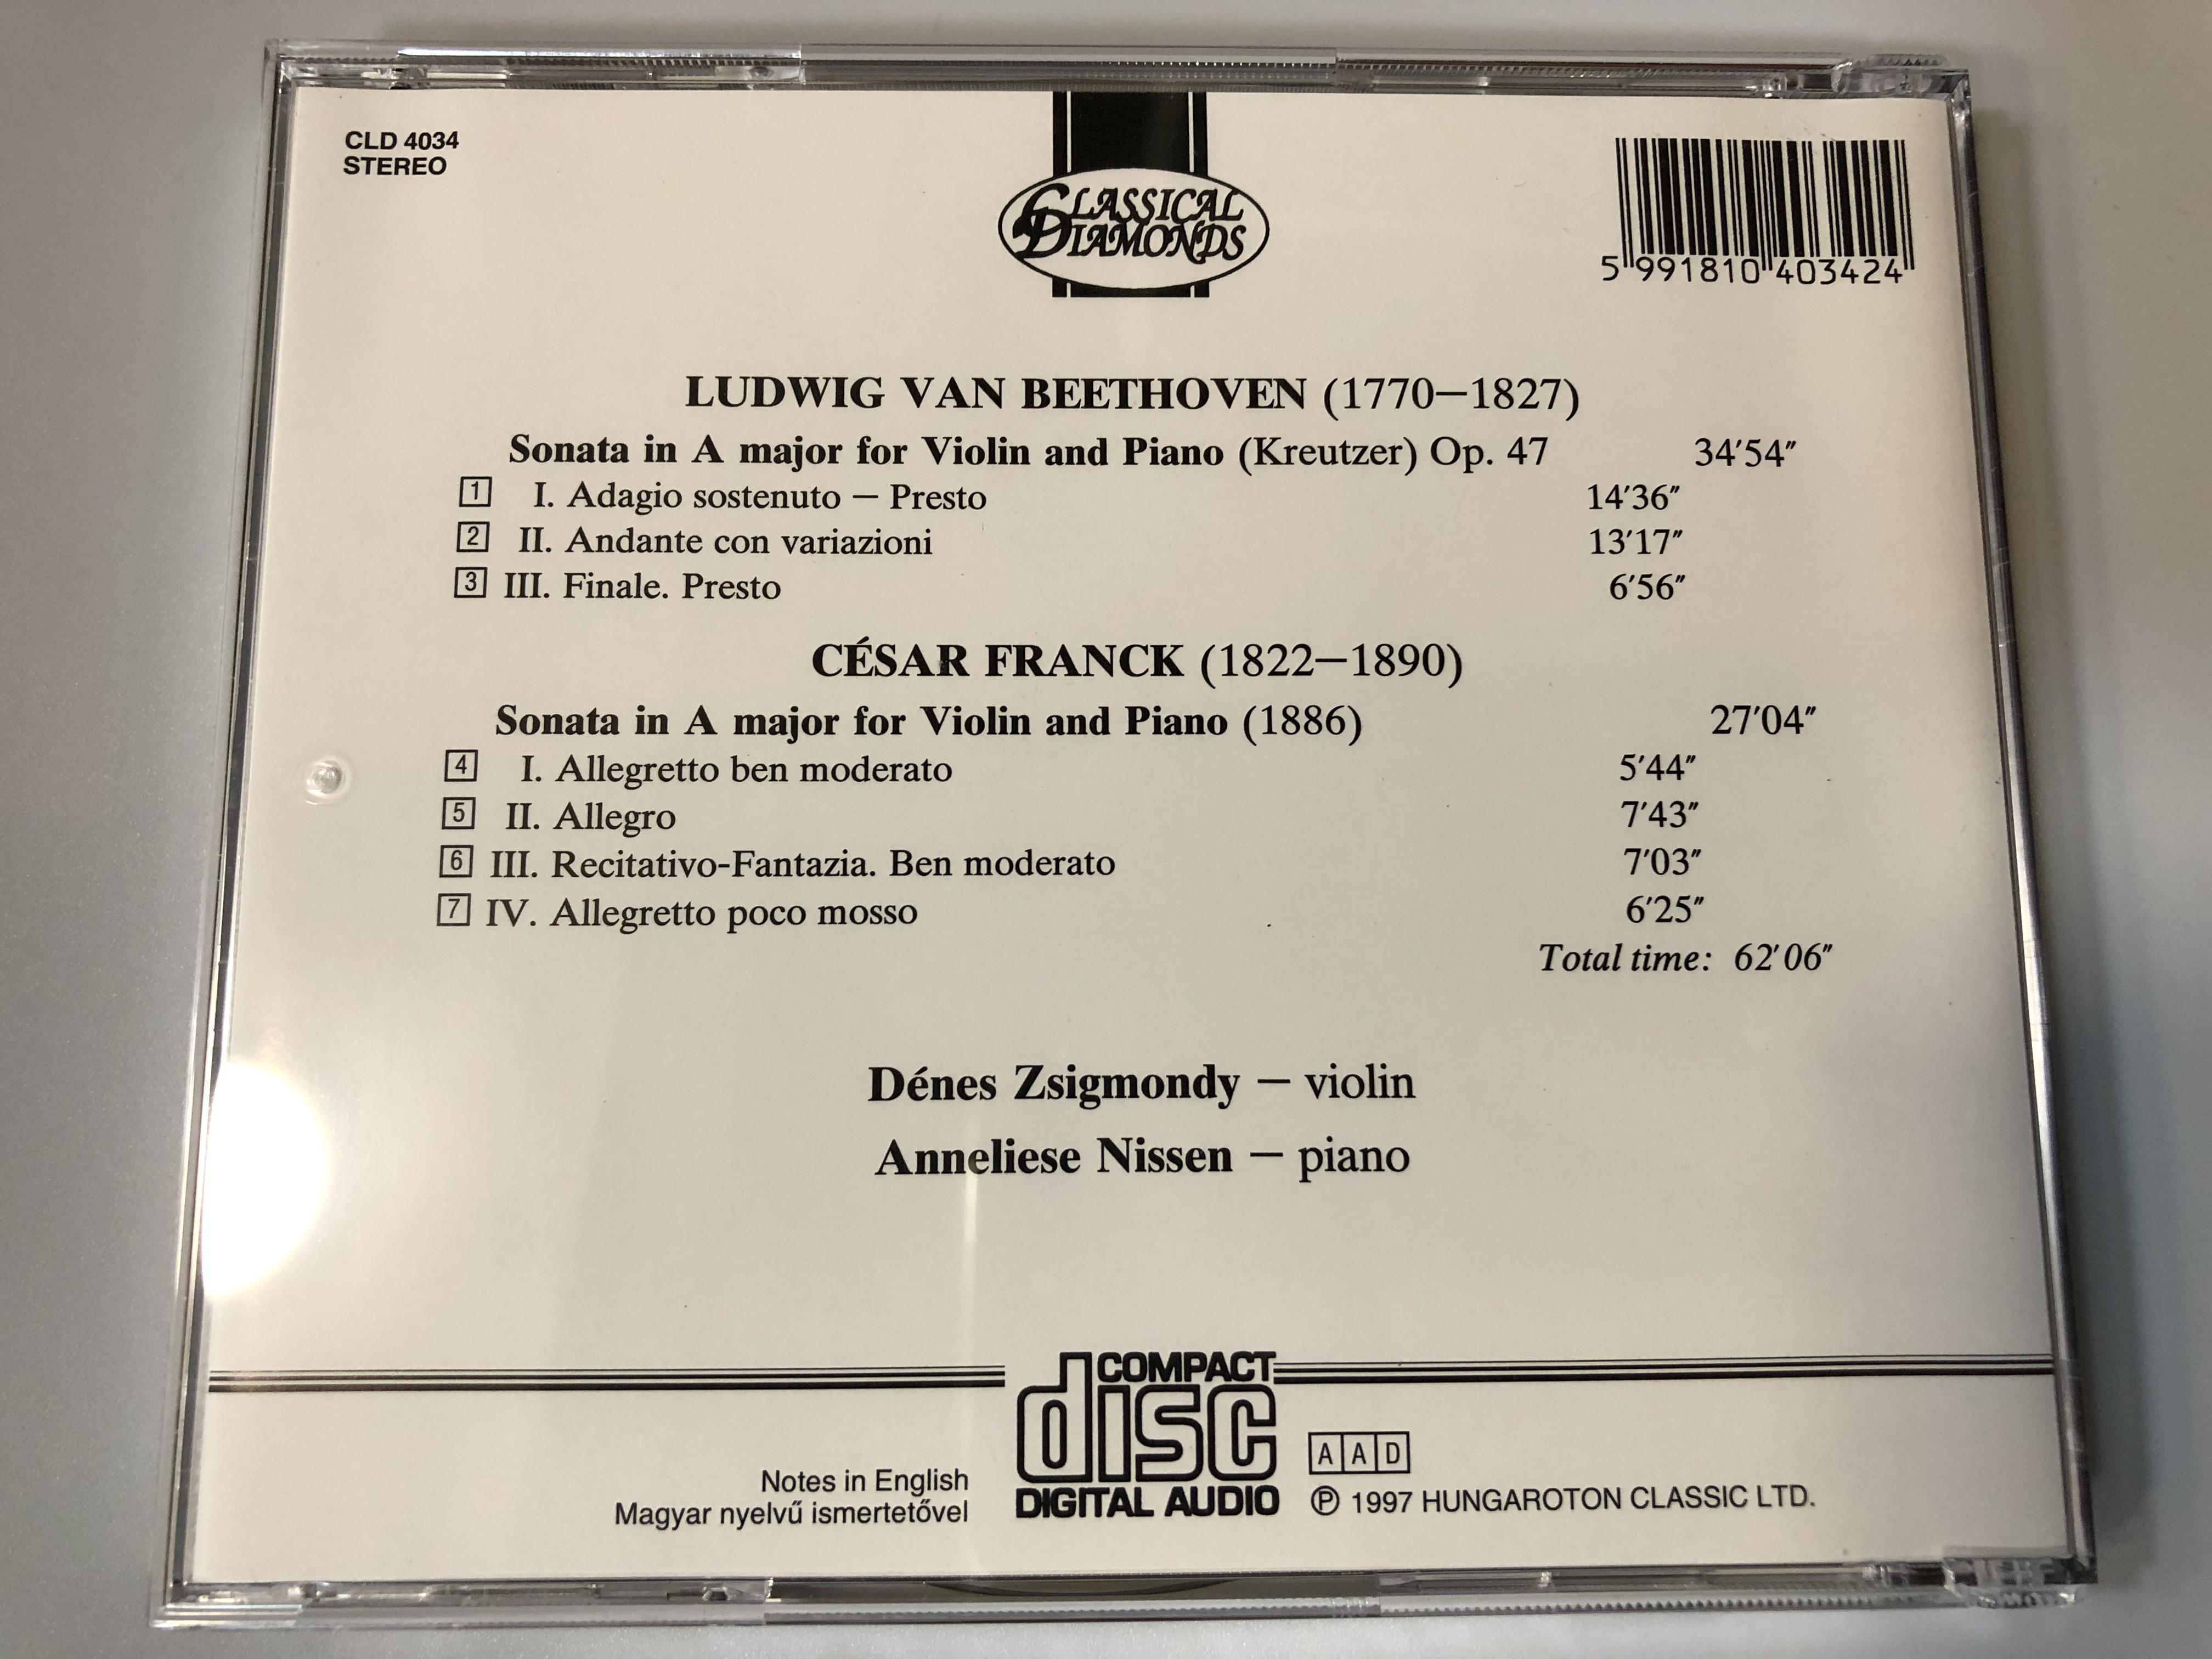 beethoven-sonata-in-a-major-kreutzer-cesar-franck-sonata-in-a-major-denes-zsigmondy-violin-anneliese-nissen-piano-classical-diamonds-hungaroton-classic-audio-cd-1997-stereo-cld-4-6-.jpg